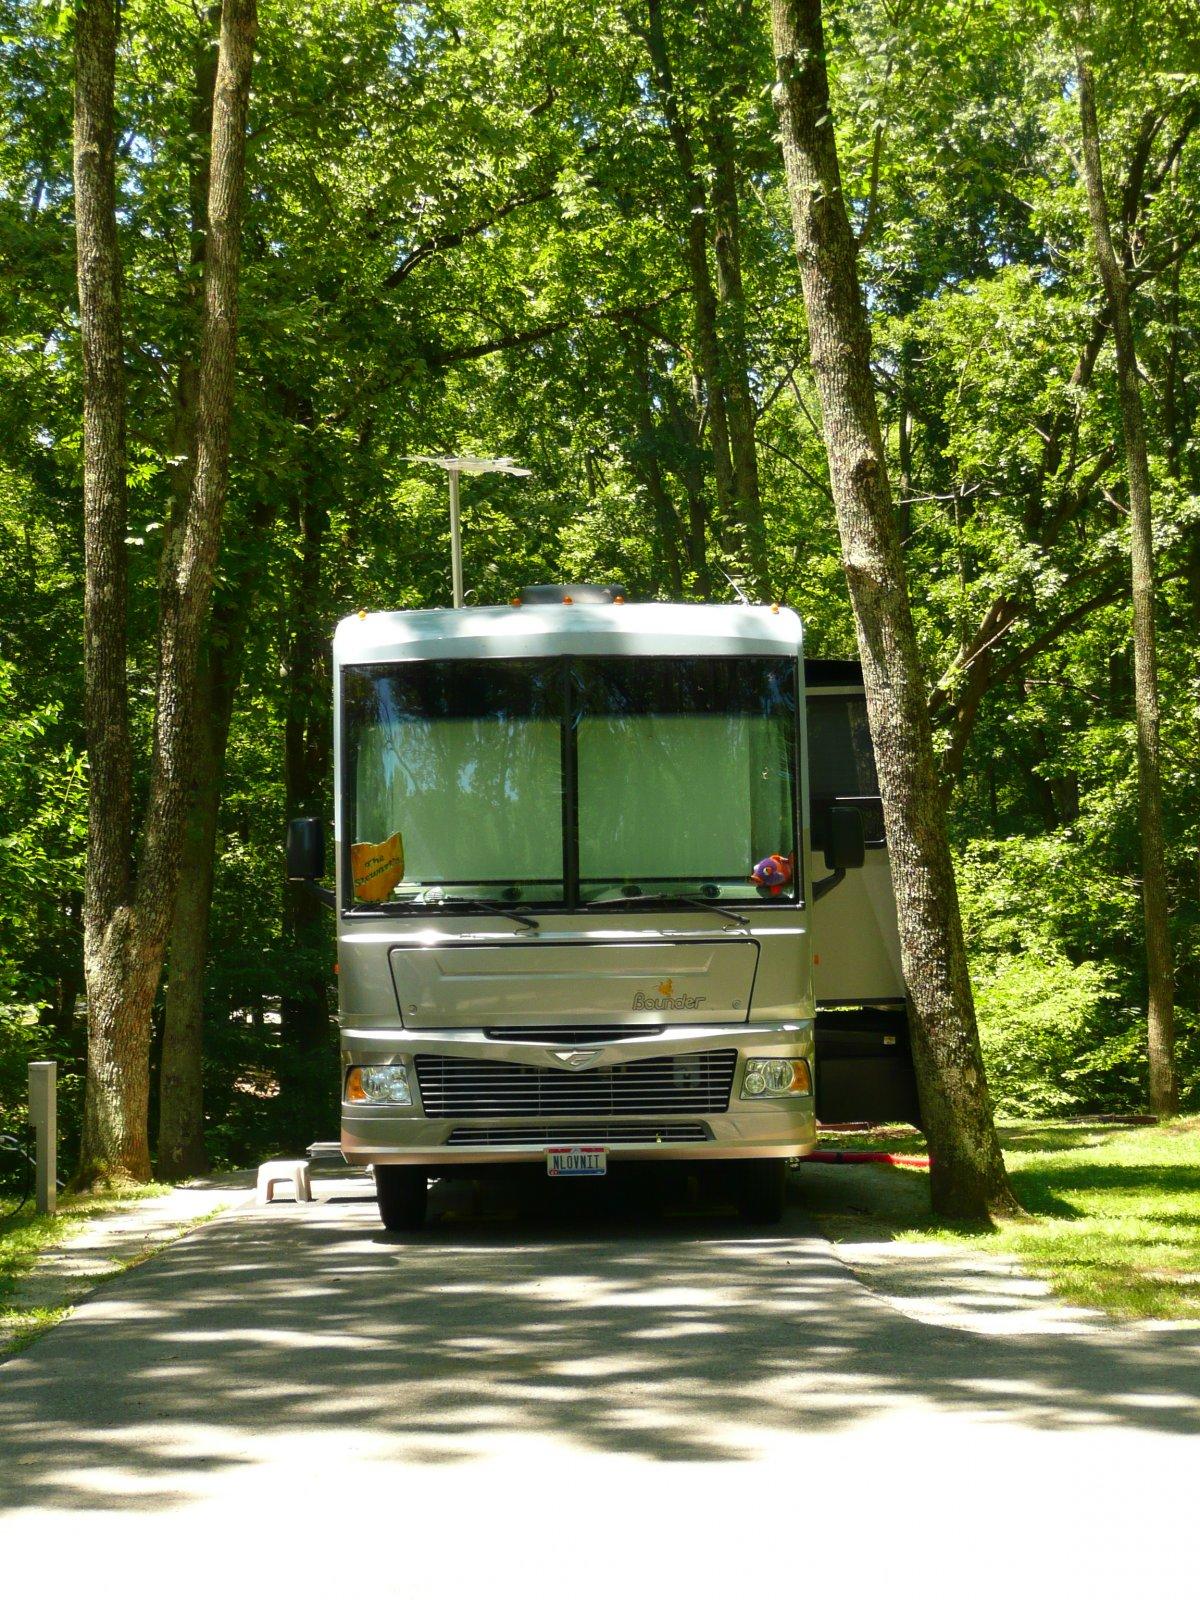 Click image for larger version  Name:General Butler Resort State Park 008.jpg Views:123 Size:585.2 KB ID:10564